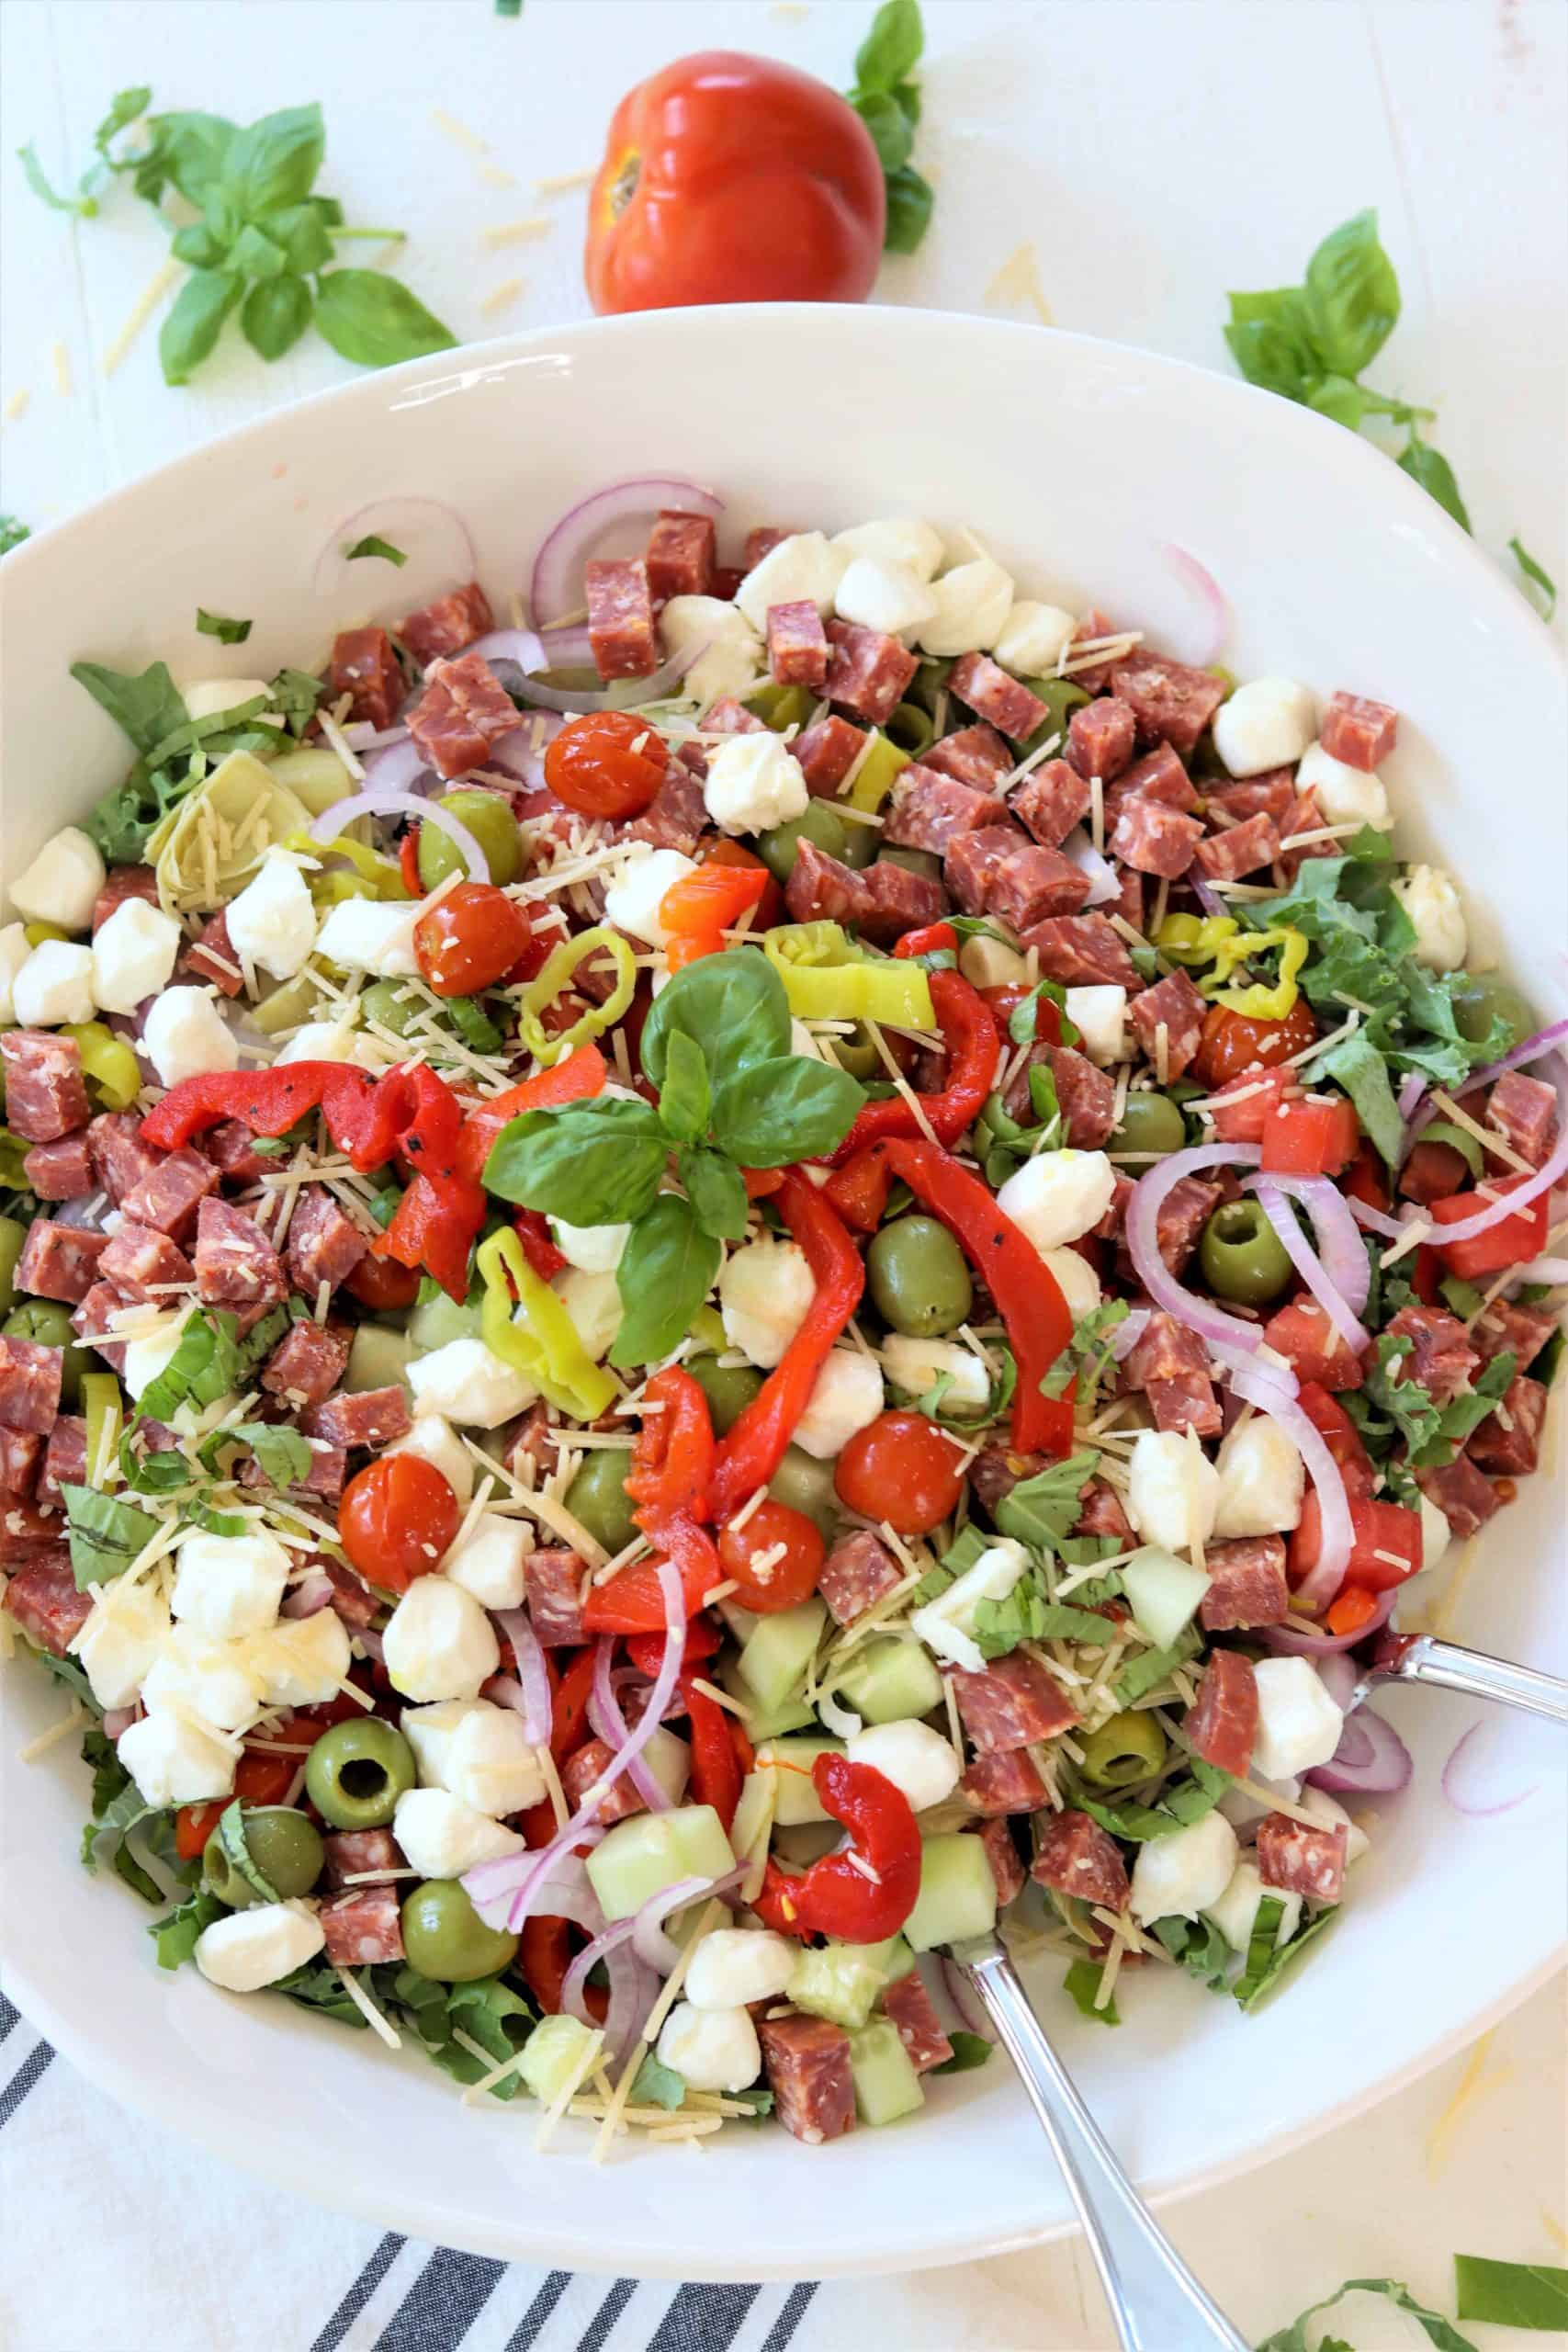 Italian Antipasto Salad Recipe Keto Low Carb Seeking Good Eats